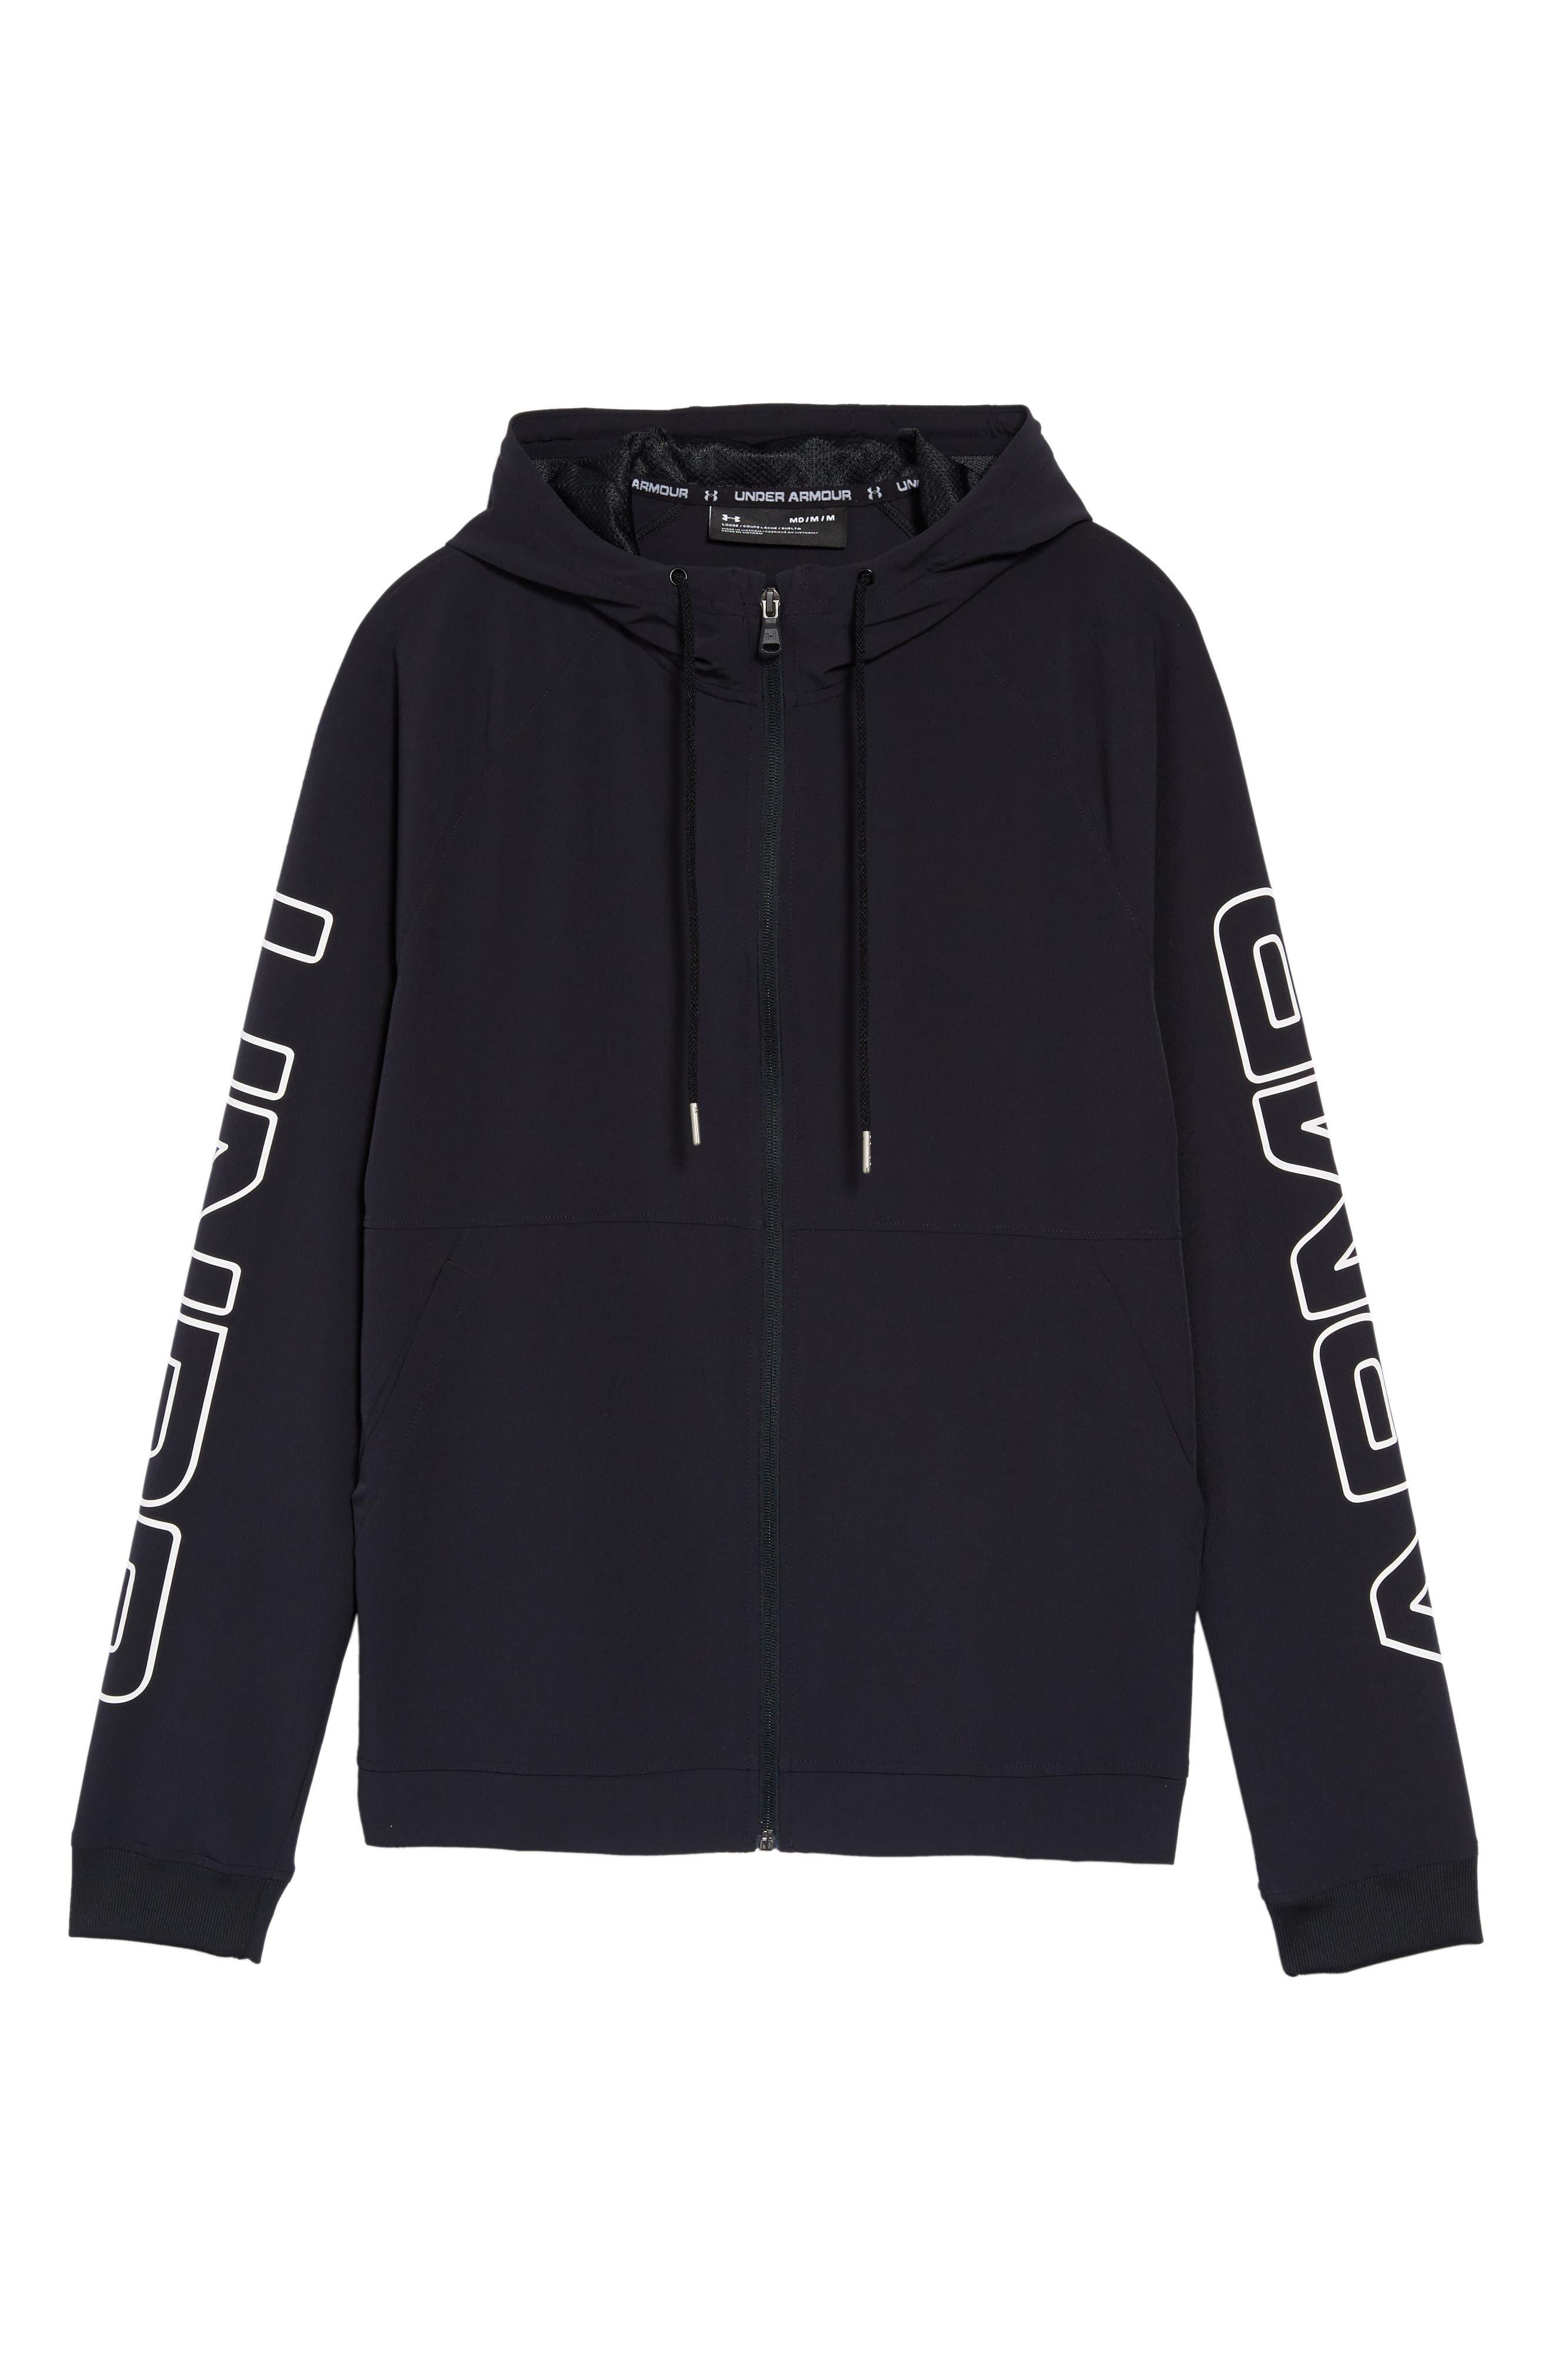 UNDER ARMOUR, Baseline Hooded Jacket, Alternate thumbnail 6, color, 001